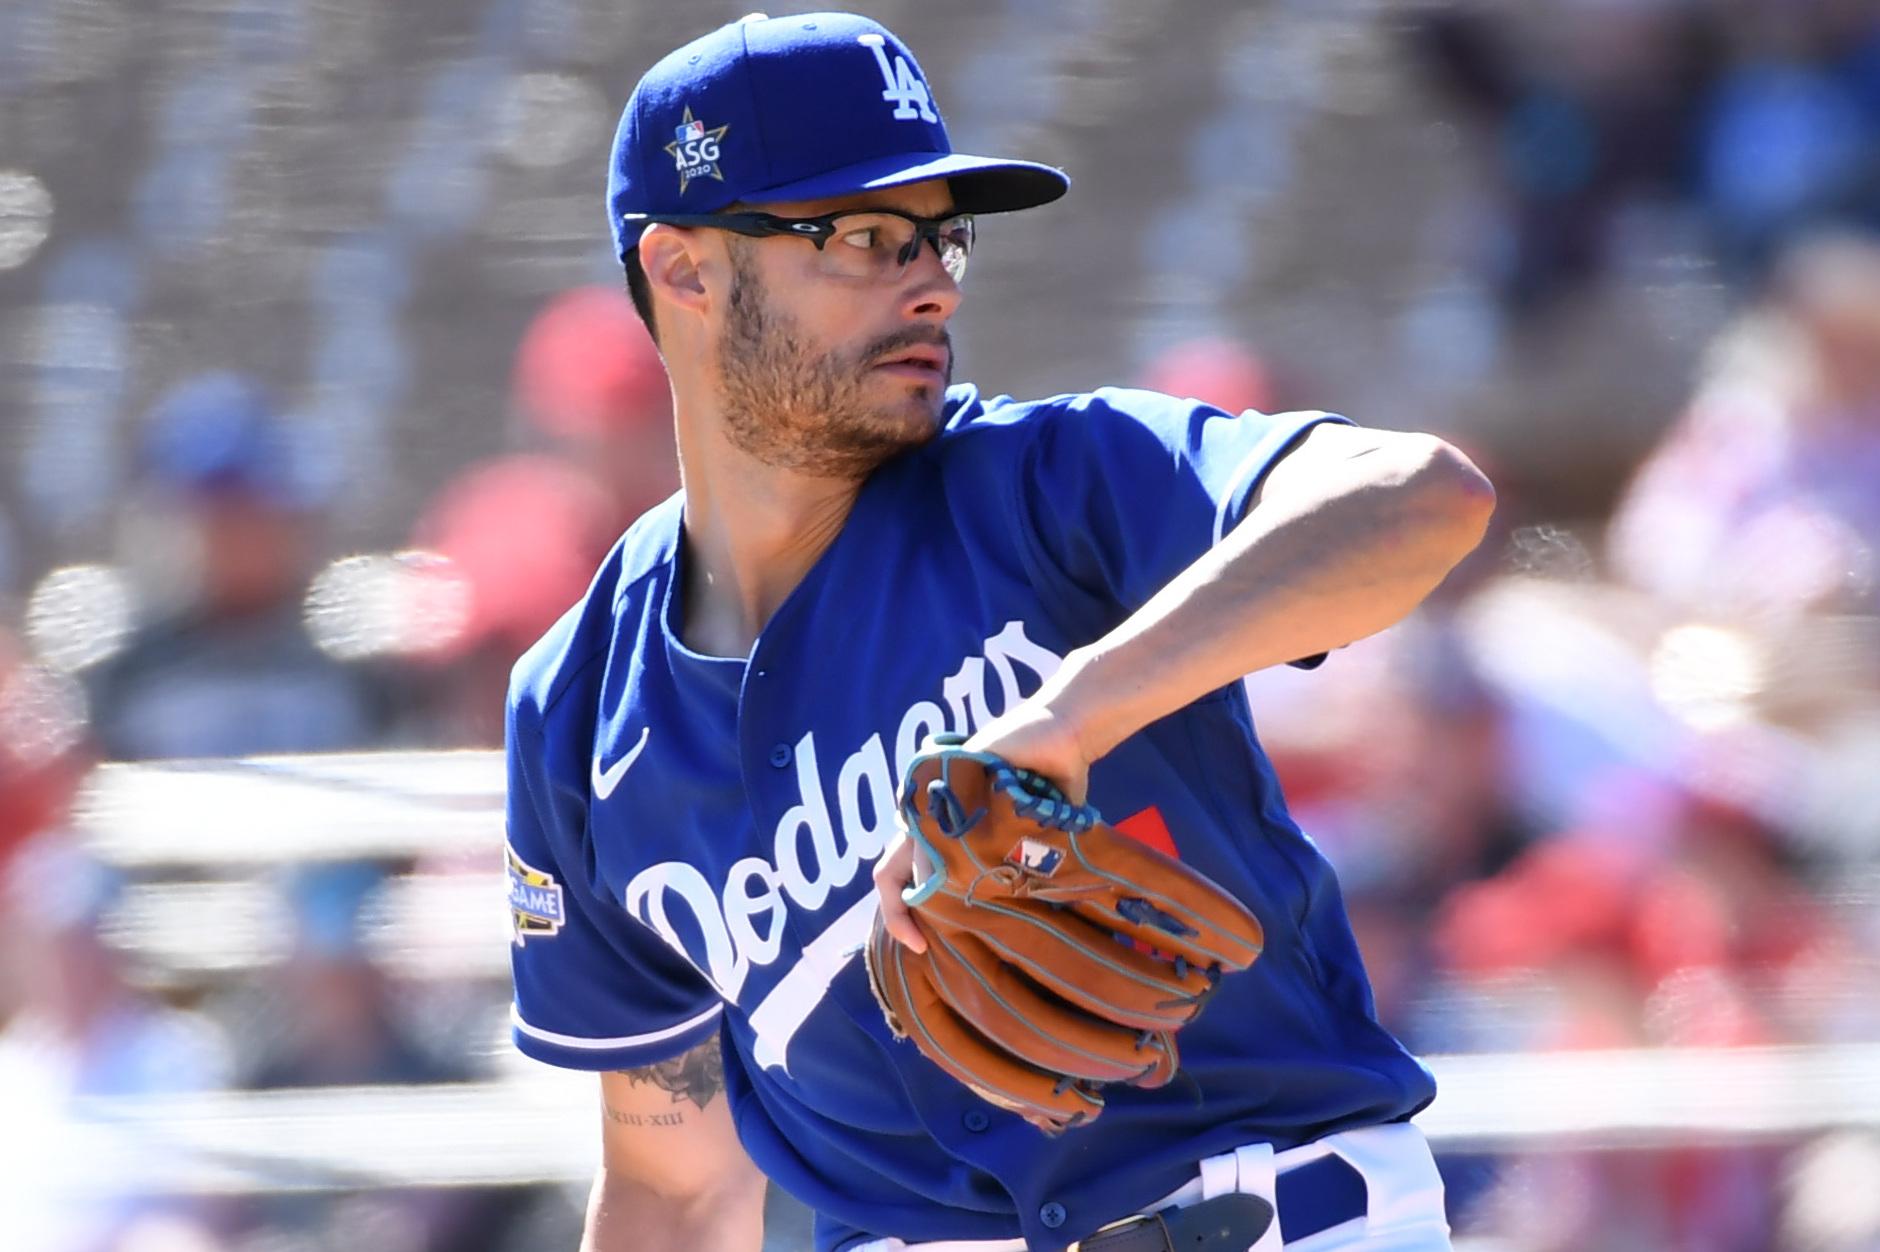 Dodgers Joe Kelly Breaks Window Throwing In Backyard On Instagram Video Bleacher Report Latest News Videos And Highlights